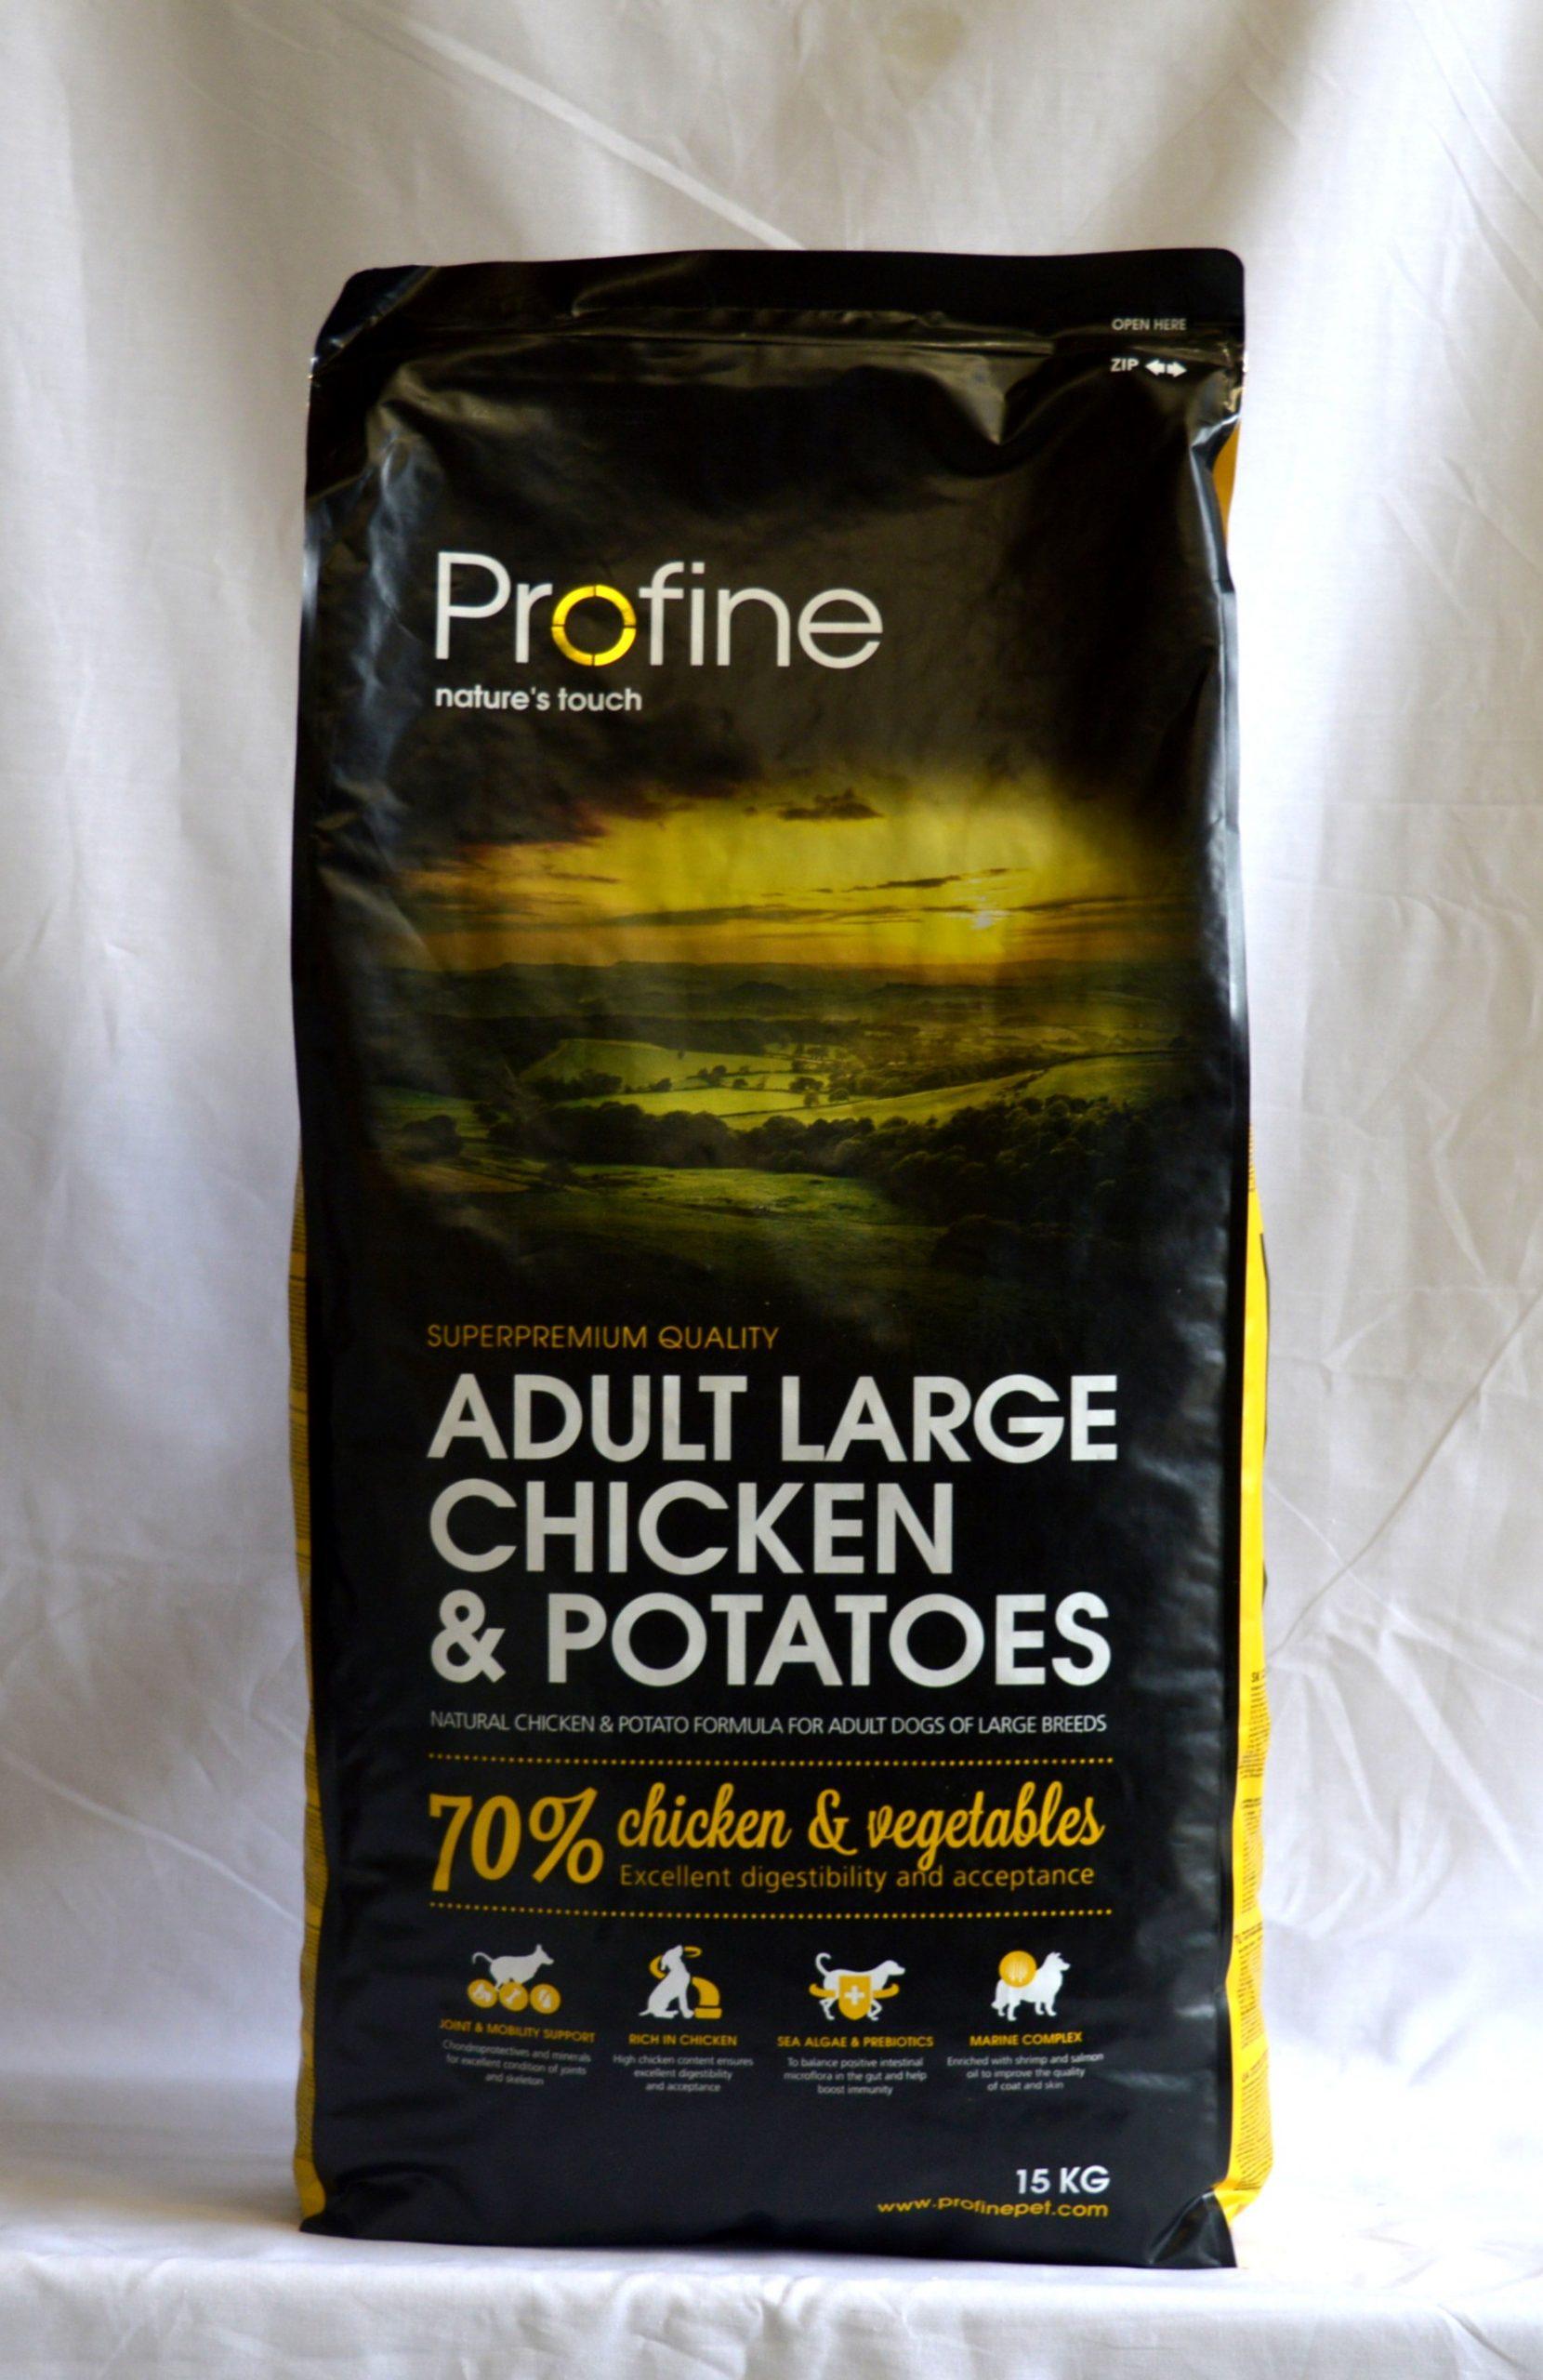 Profine Chicken & Potatoes Adult Large-15kg